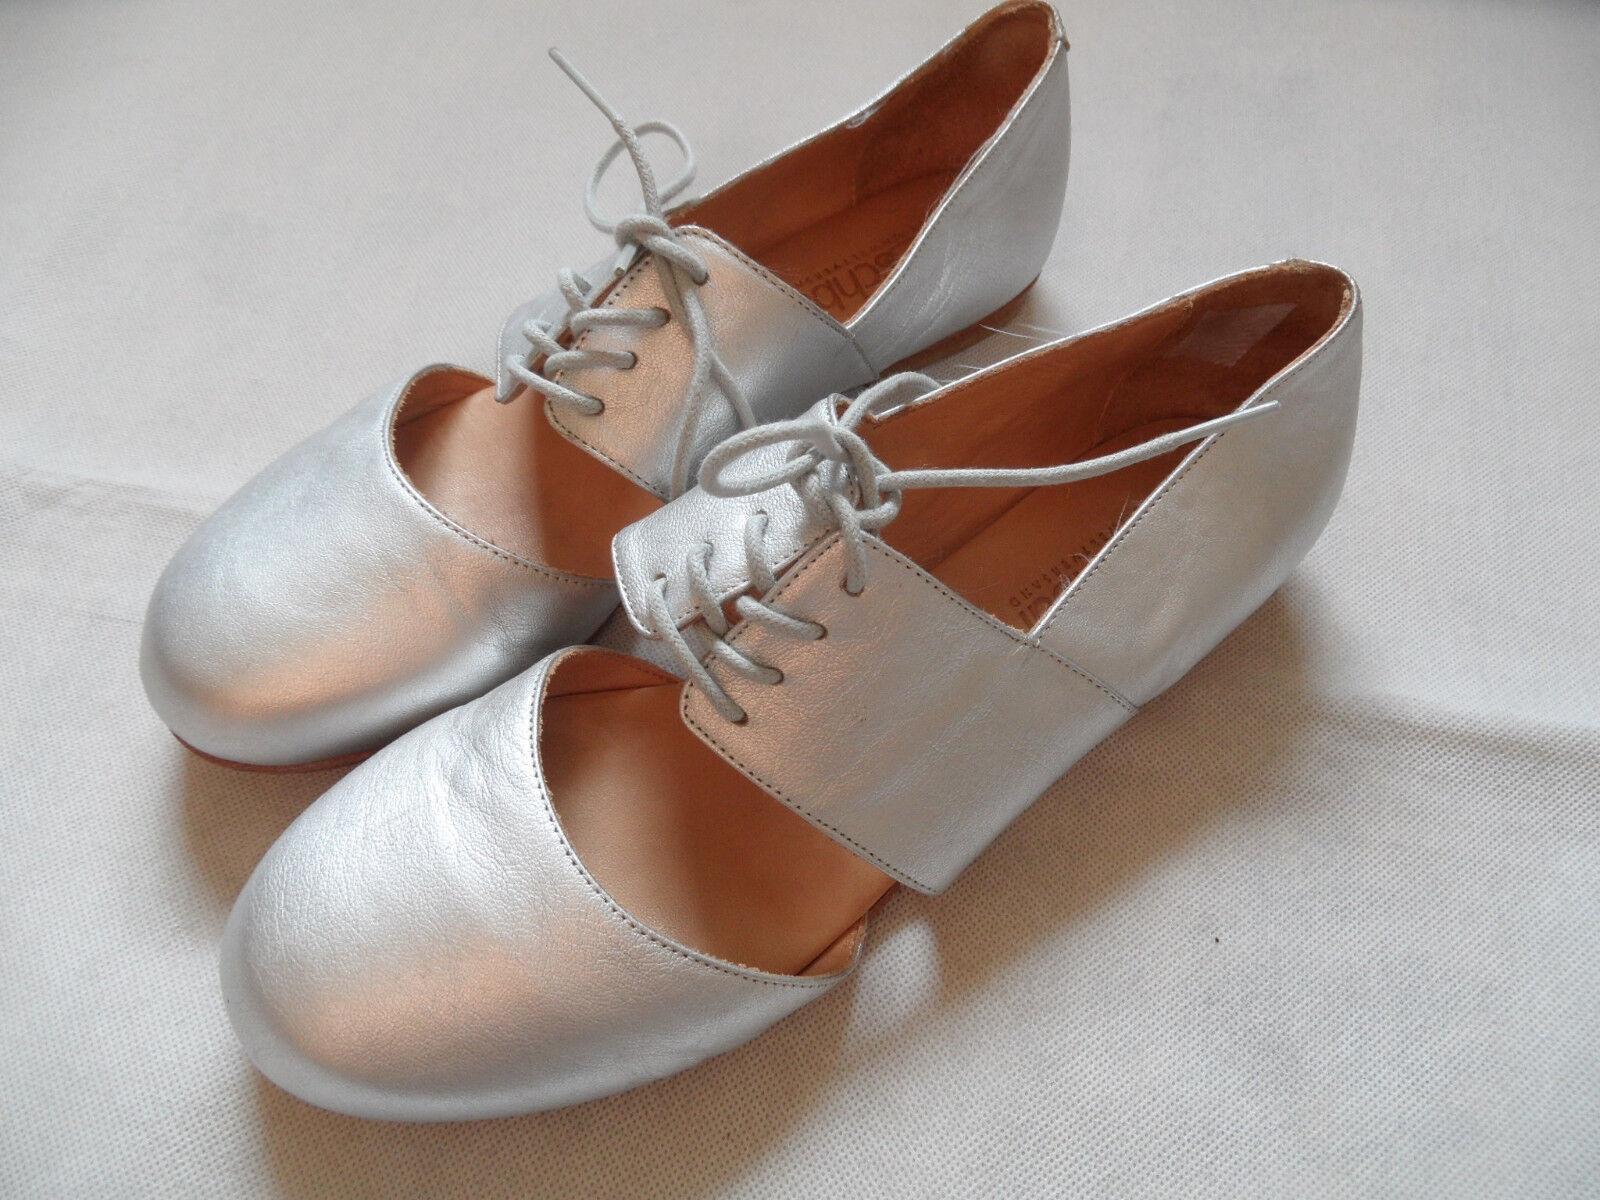 Procione eleganti ballerine sandali argentoo tg. 40 Top hmi818